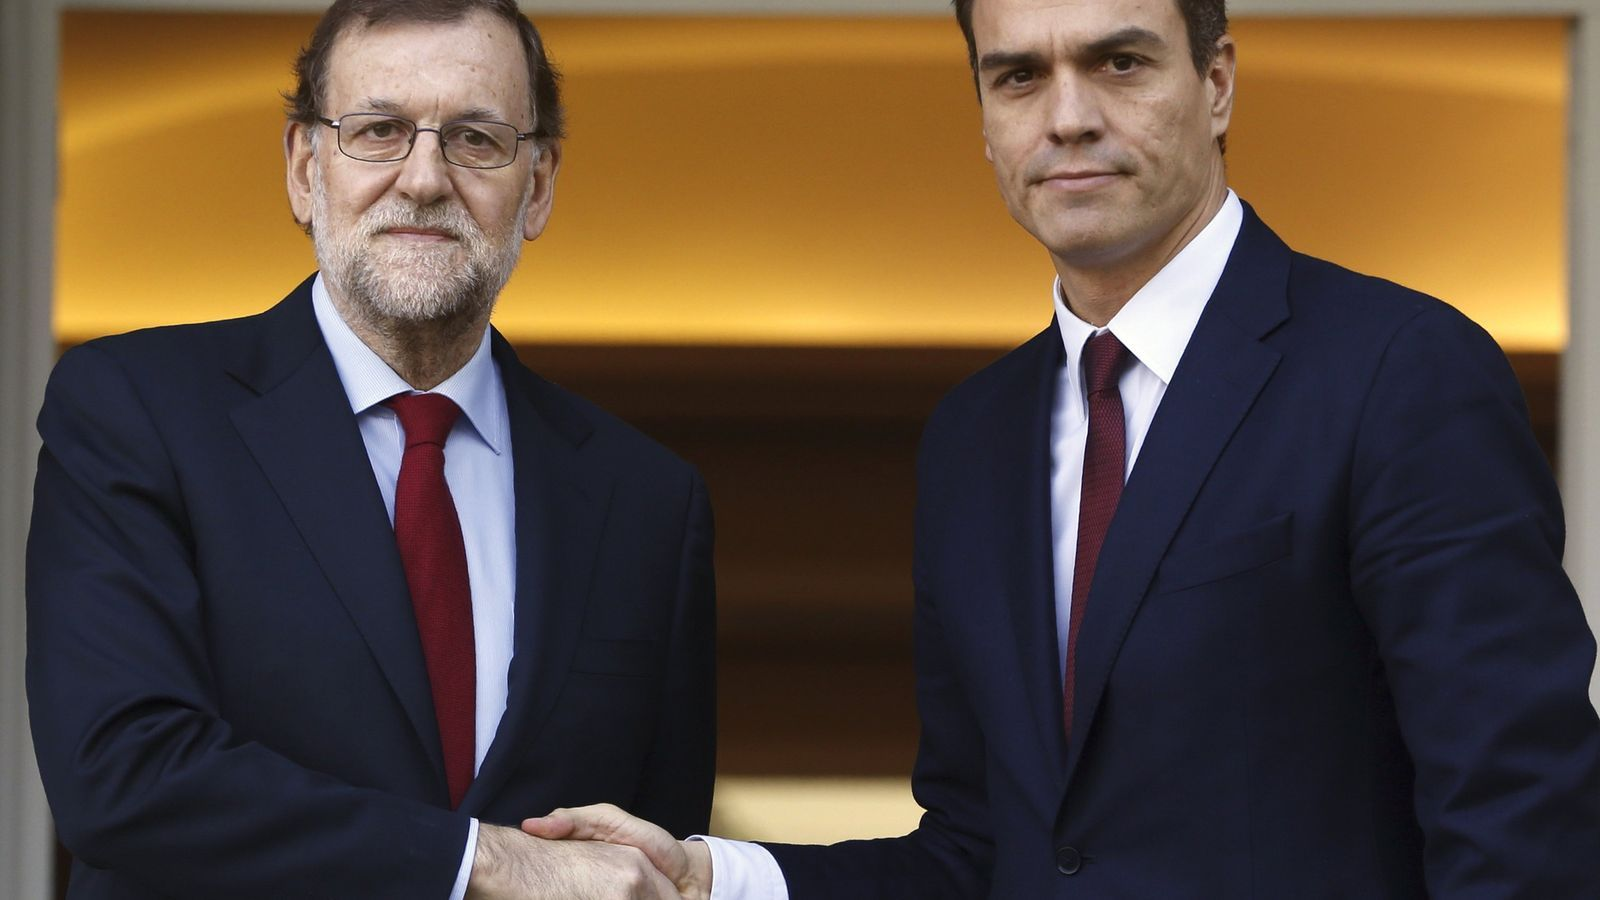 El president del govern espanyol, Mariano Rajoy, i el líder del PSOE, Pedro Sánchez, a la Moncloa / EFE